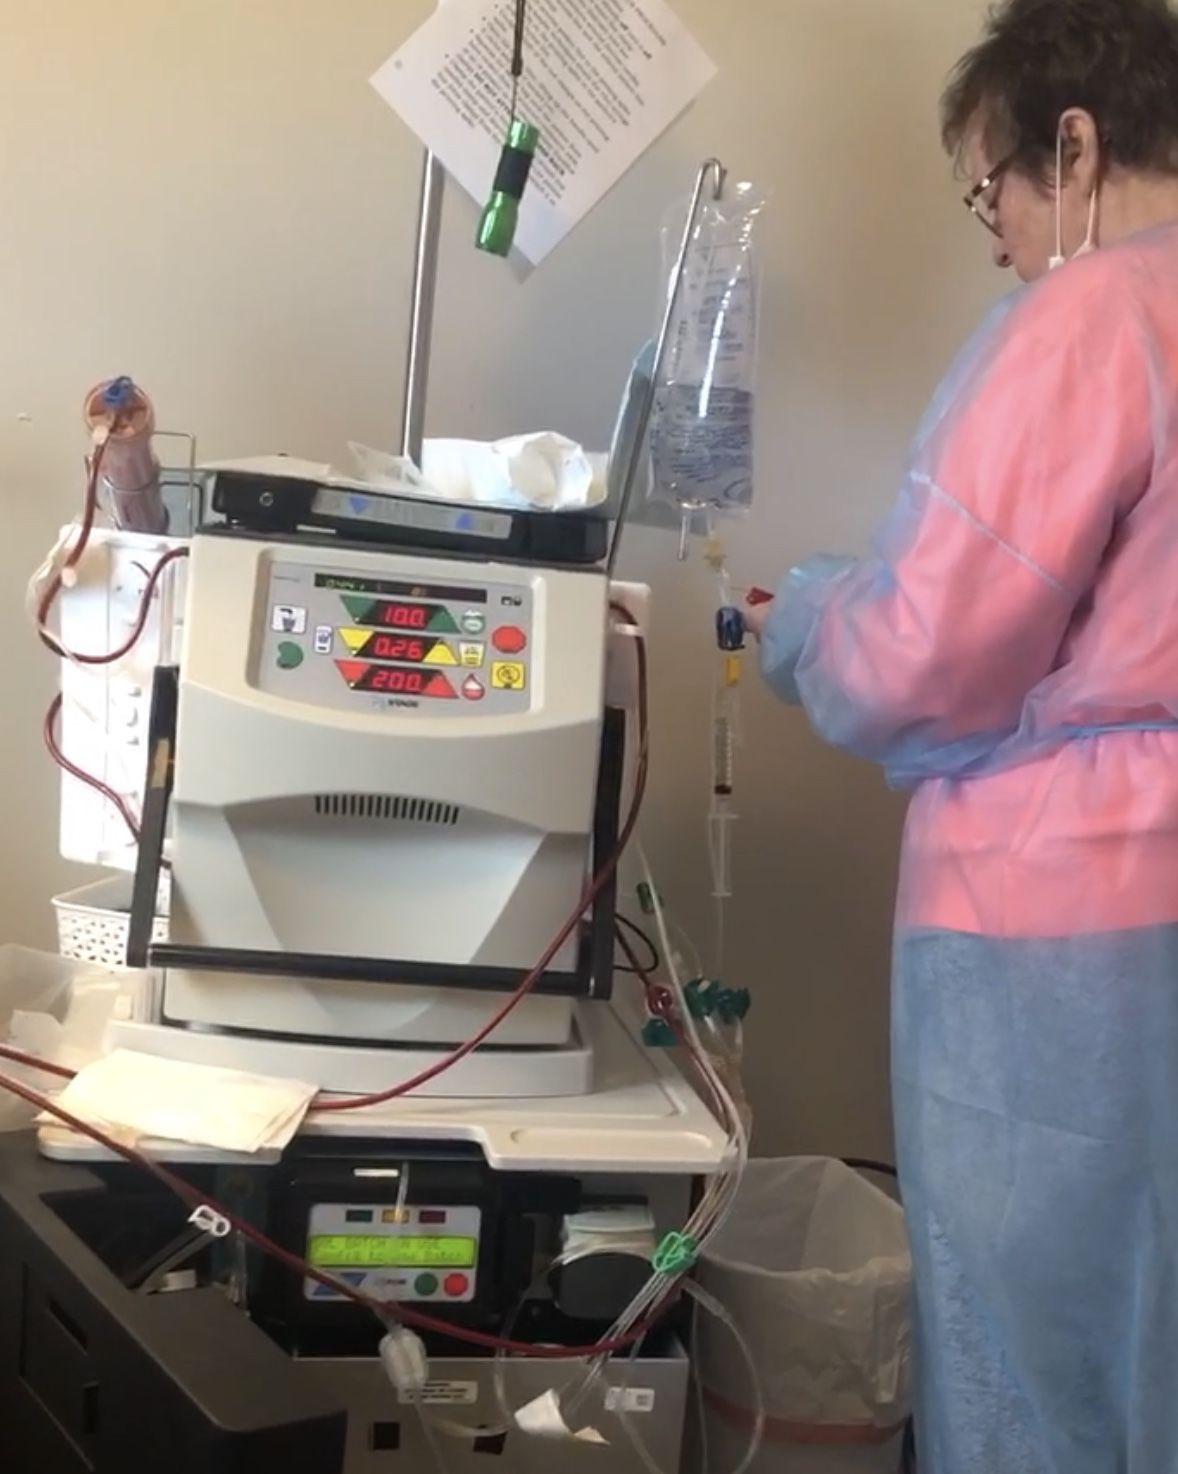 photo_ft_news_Ina Houston dialysis machine.jpeg